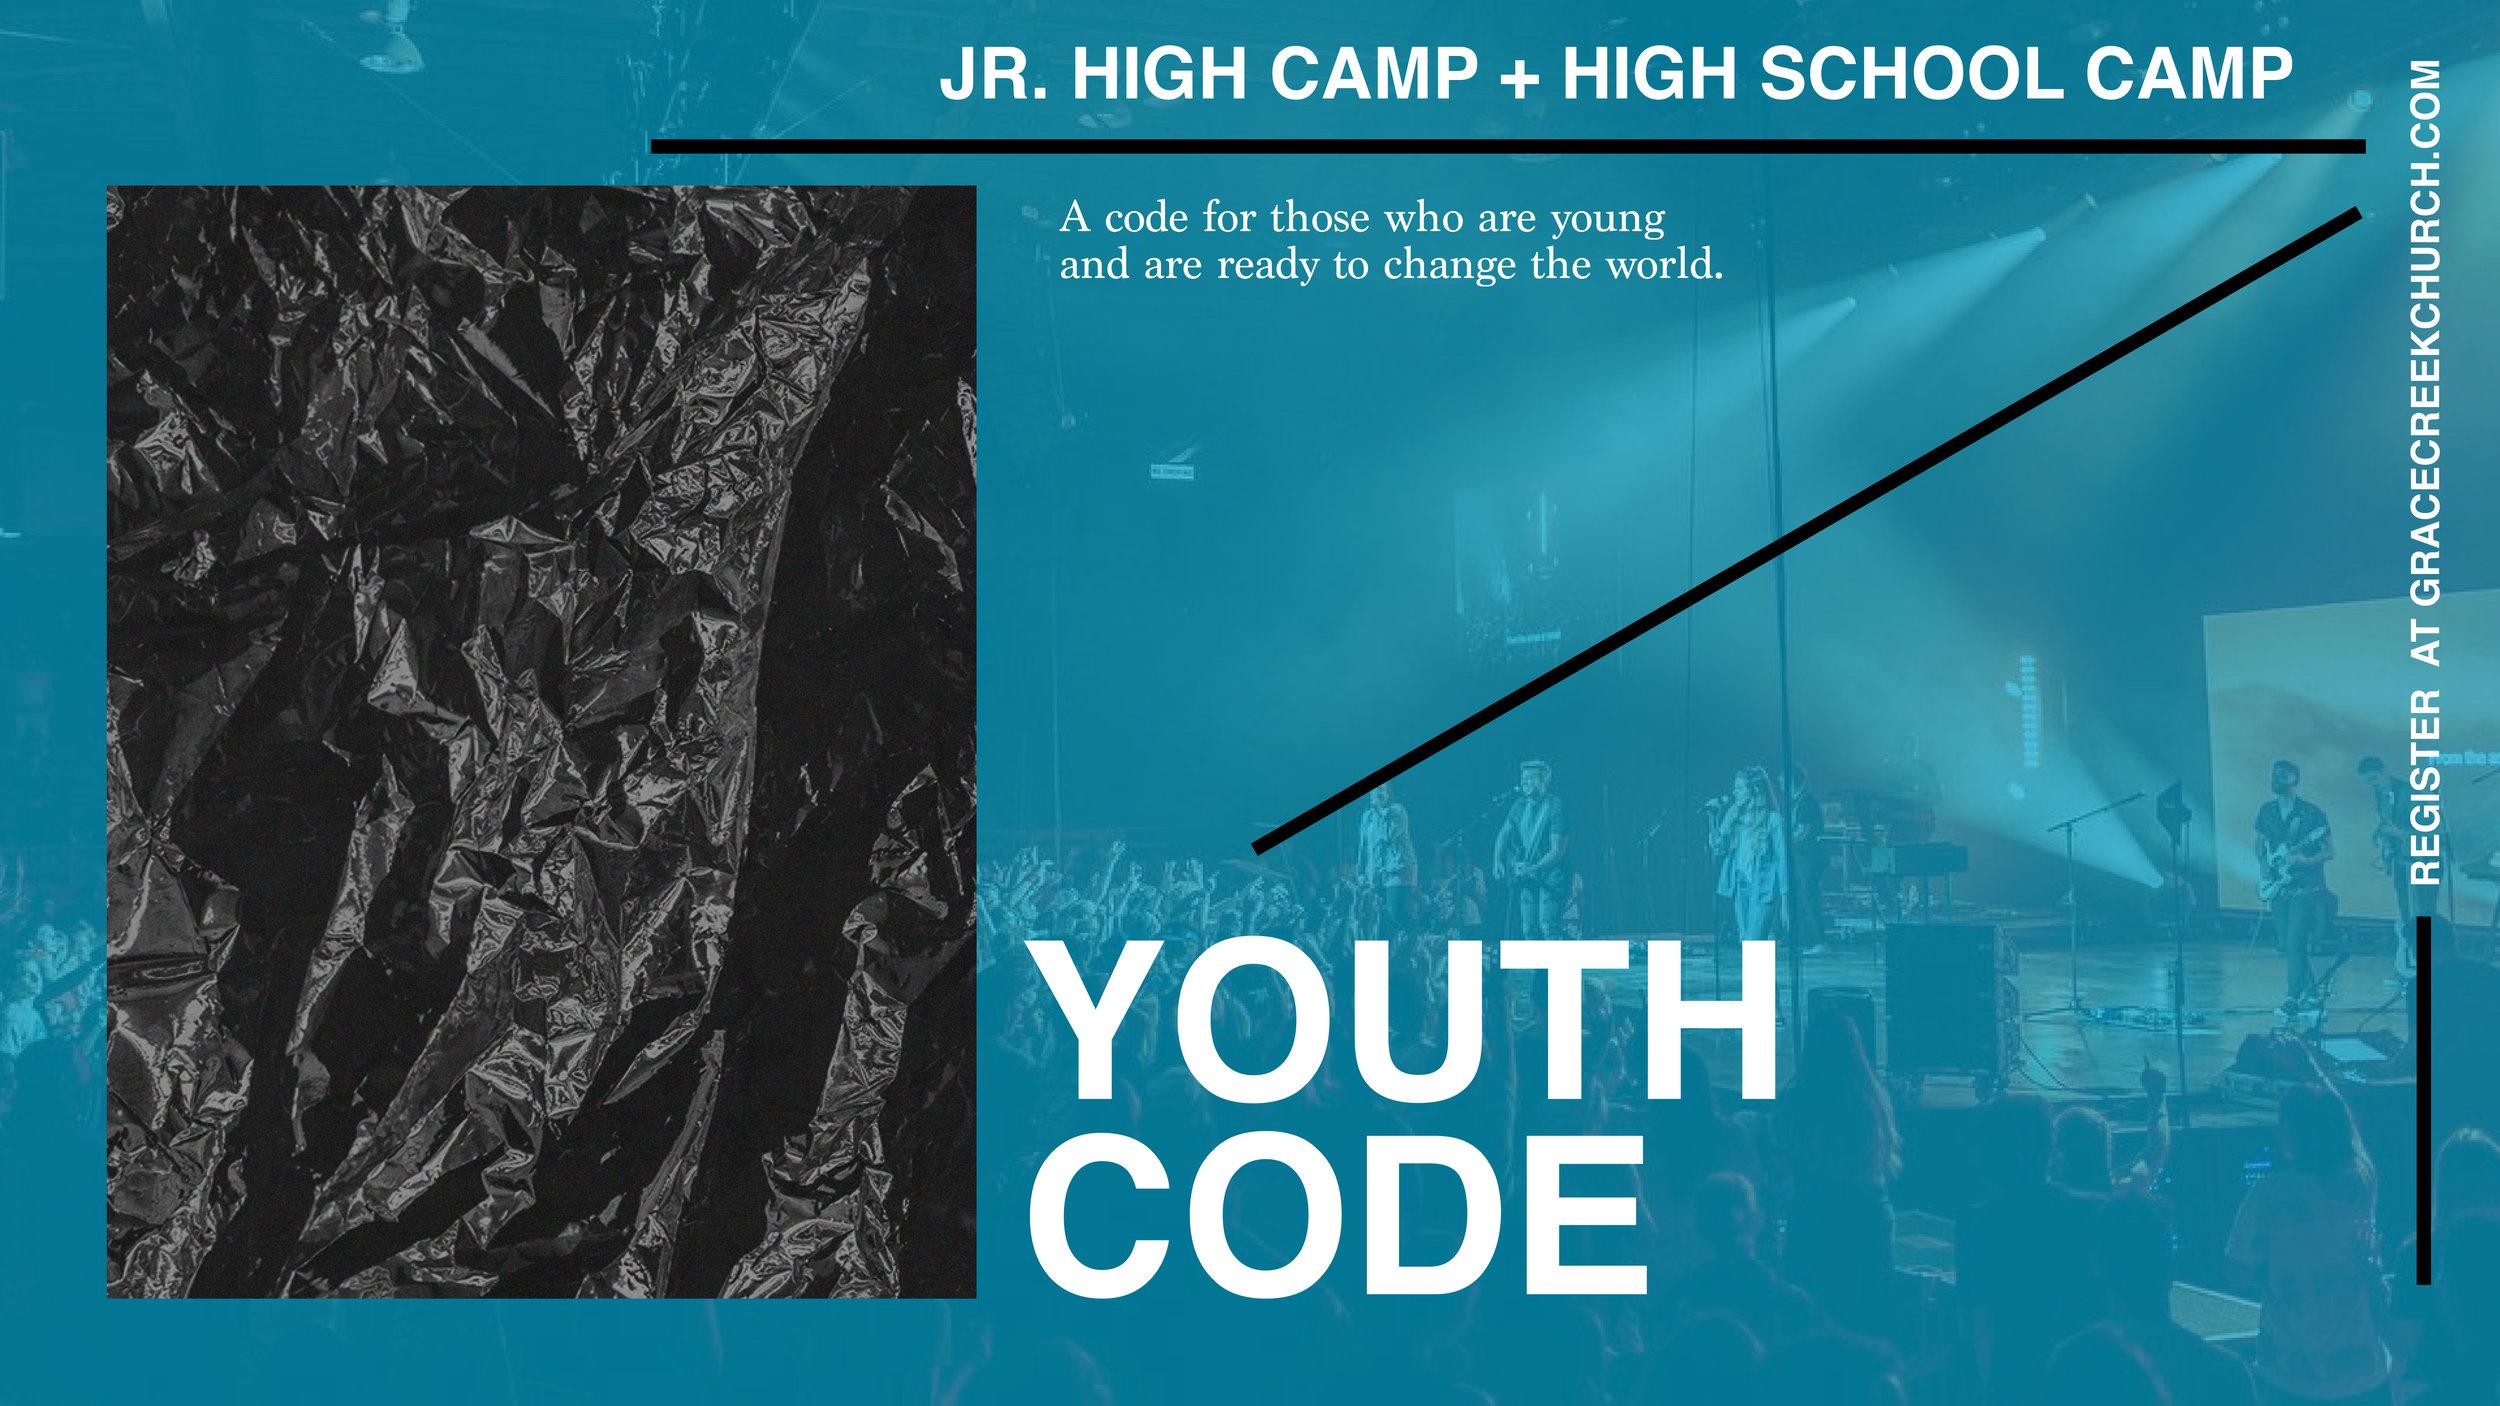 Youth Code Slide - BOTH.jpg